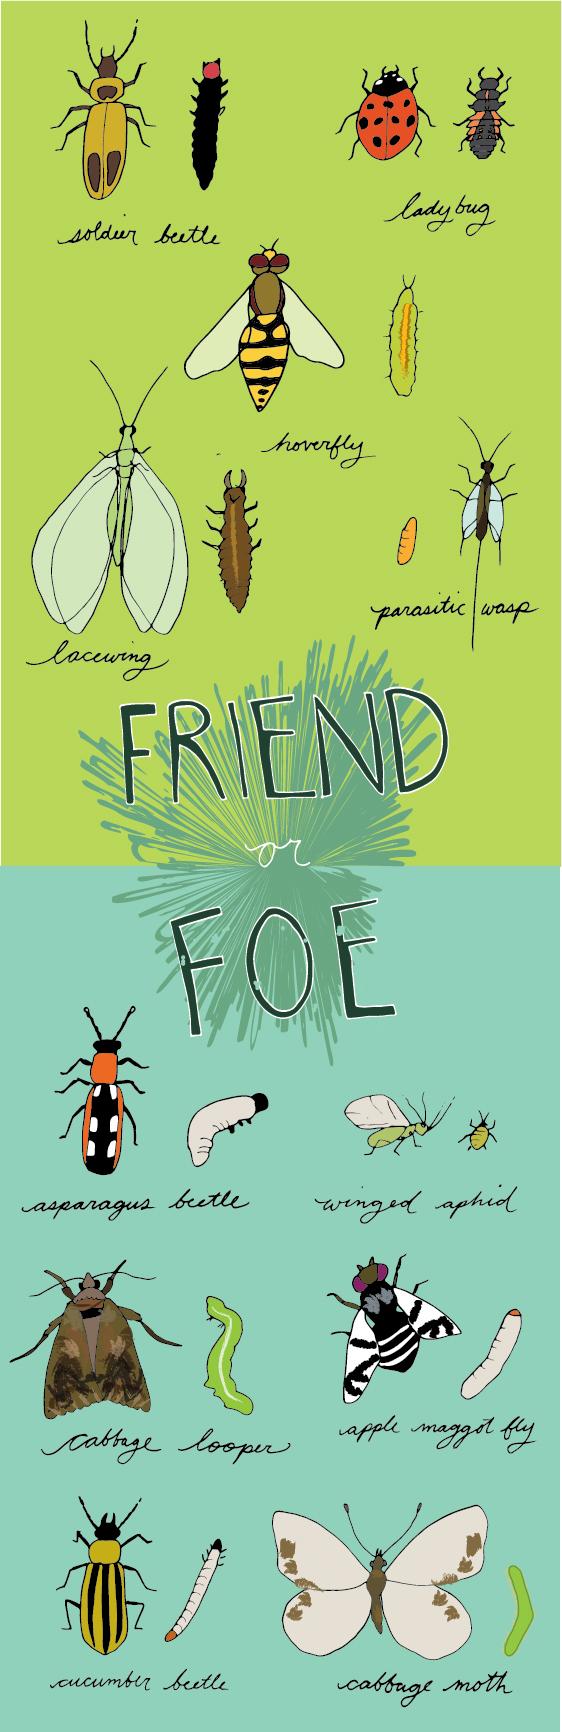 Original Illustration Provided by  Rachel Rolseth